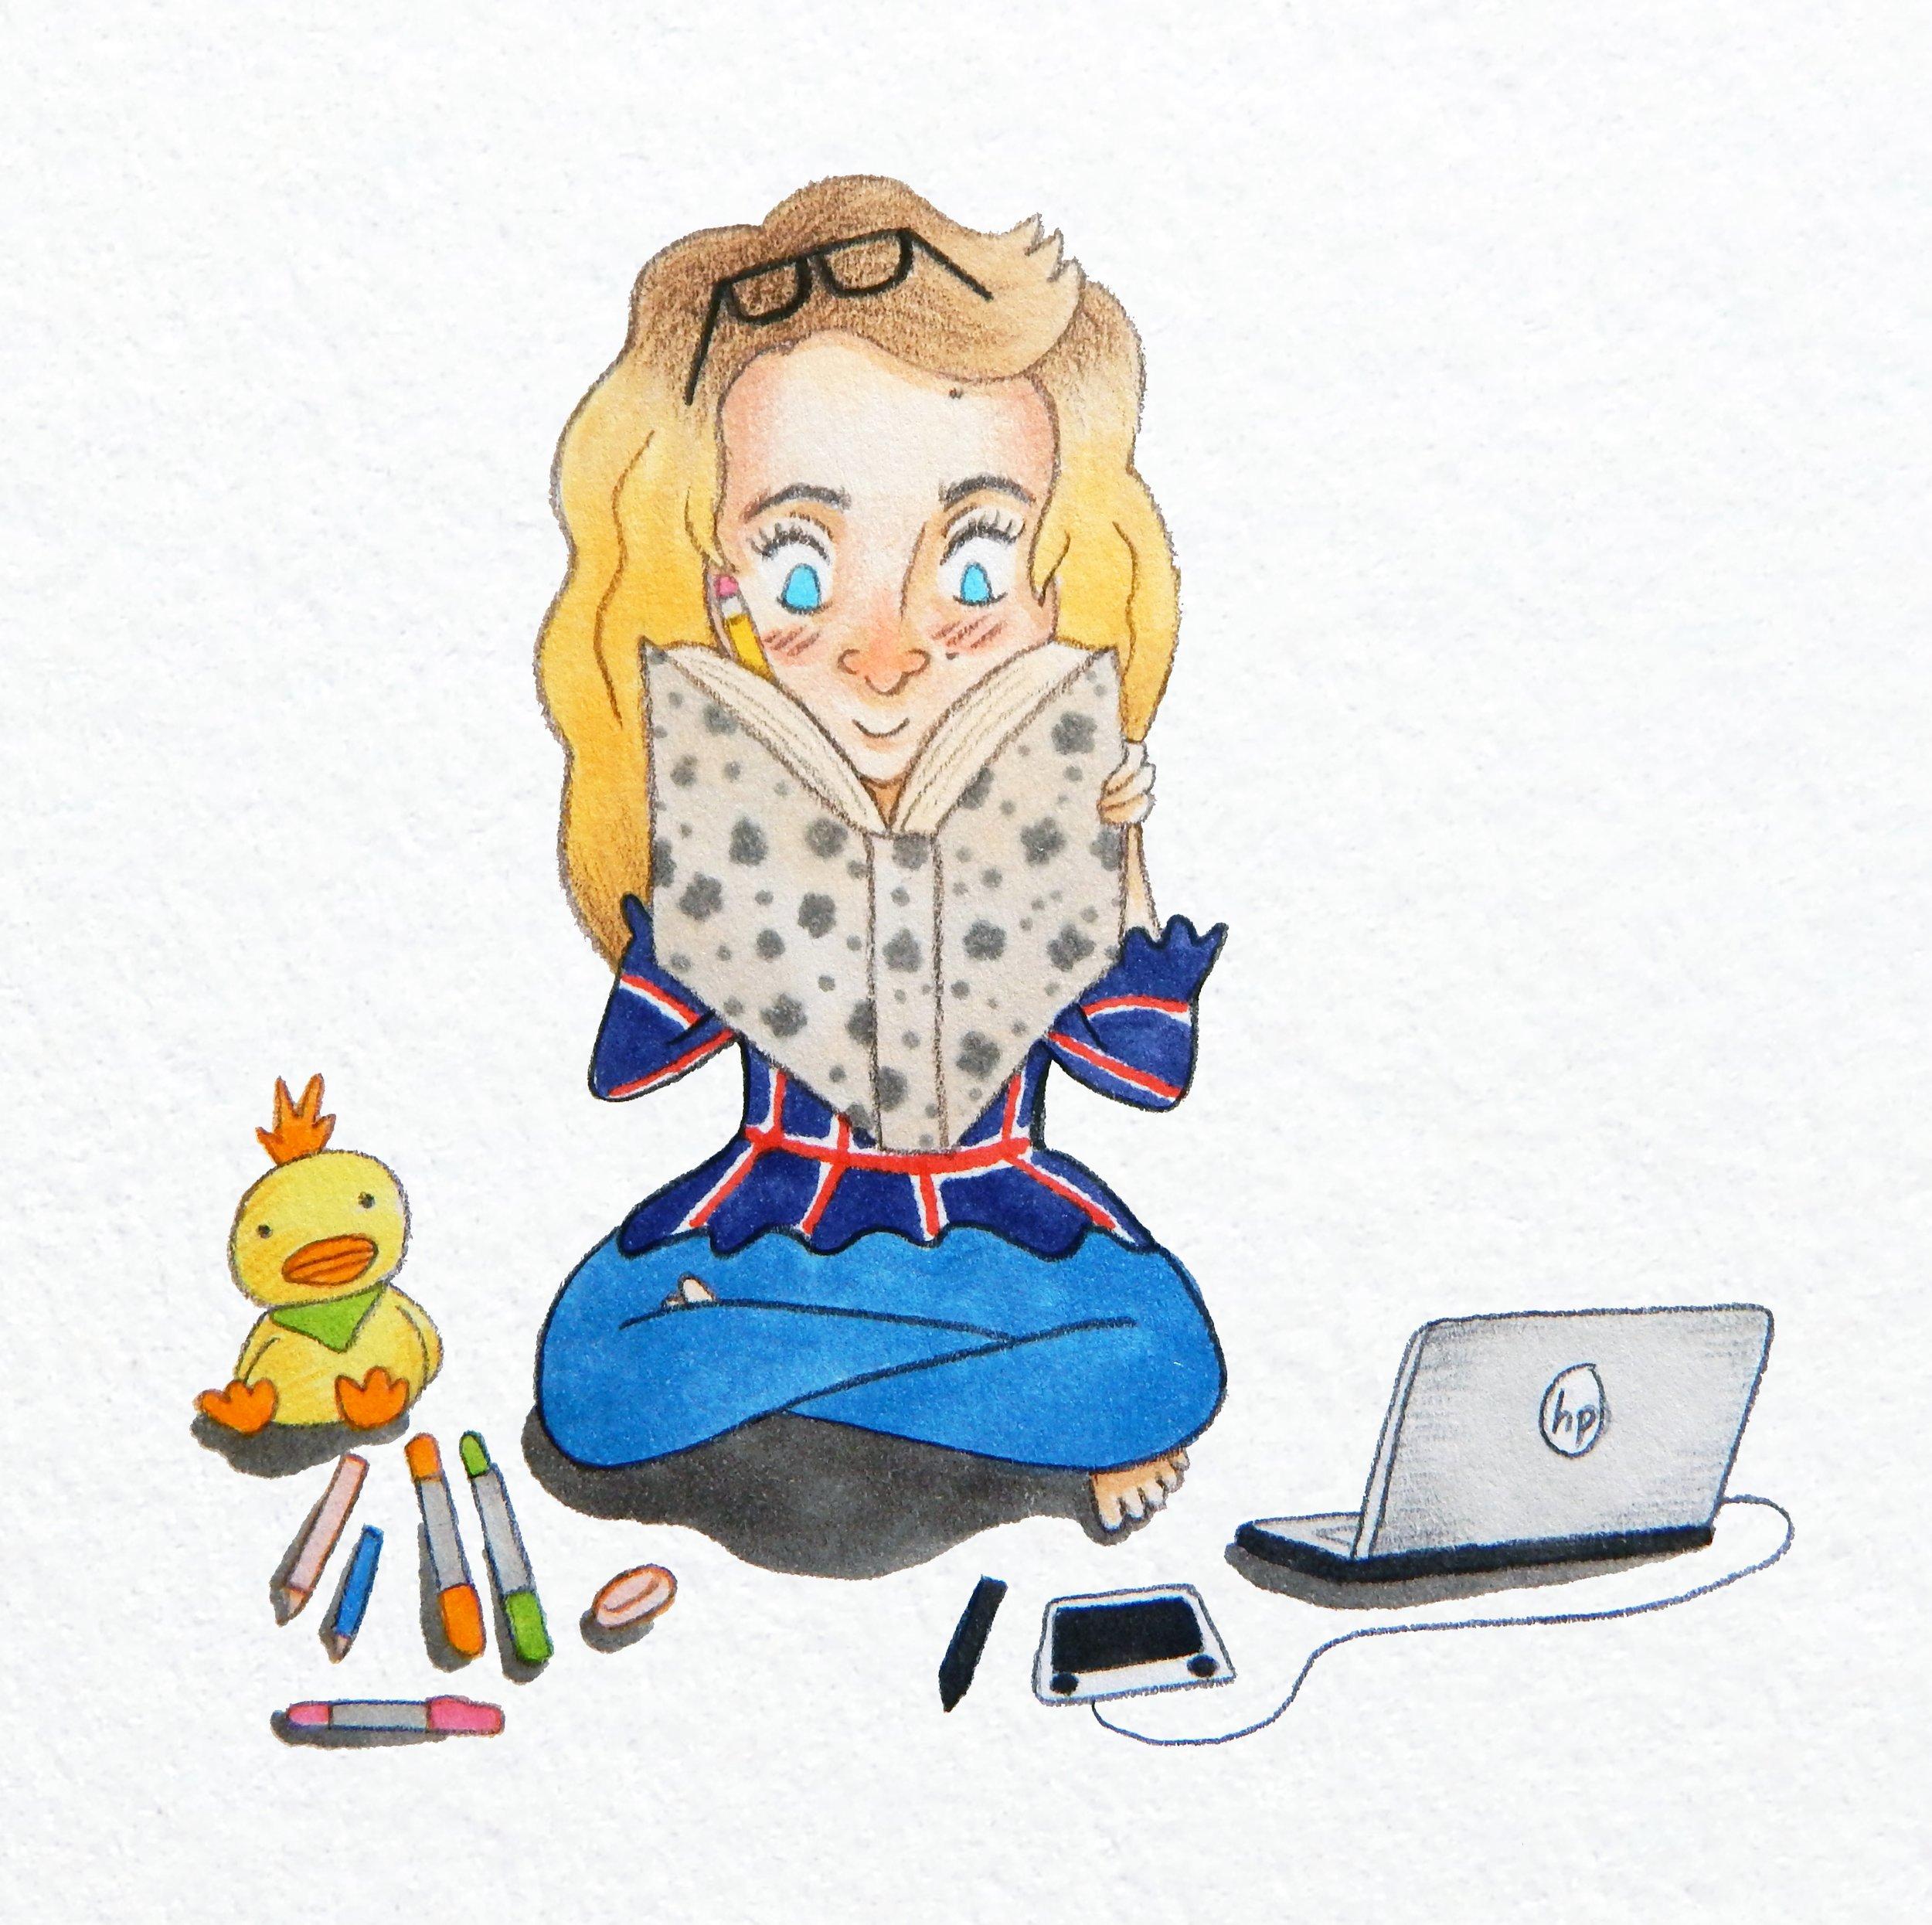 Hollie and Figgs: The Missing Rainbow illustrator Beth Hilliard